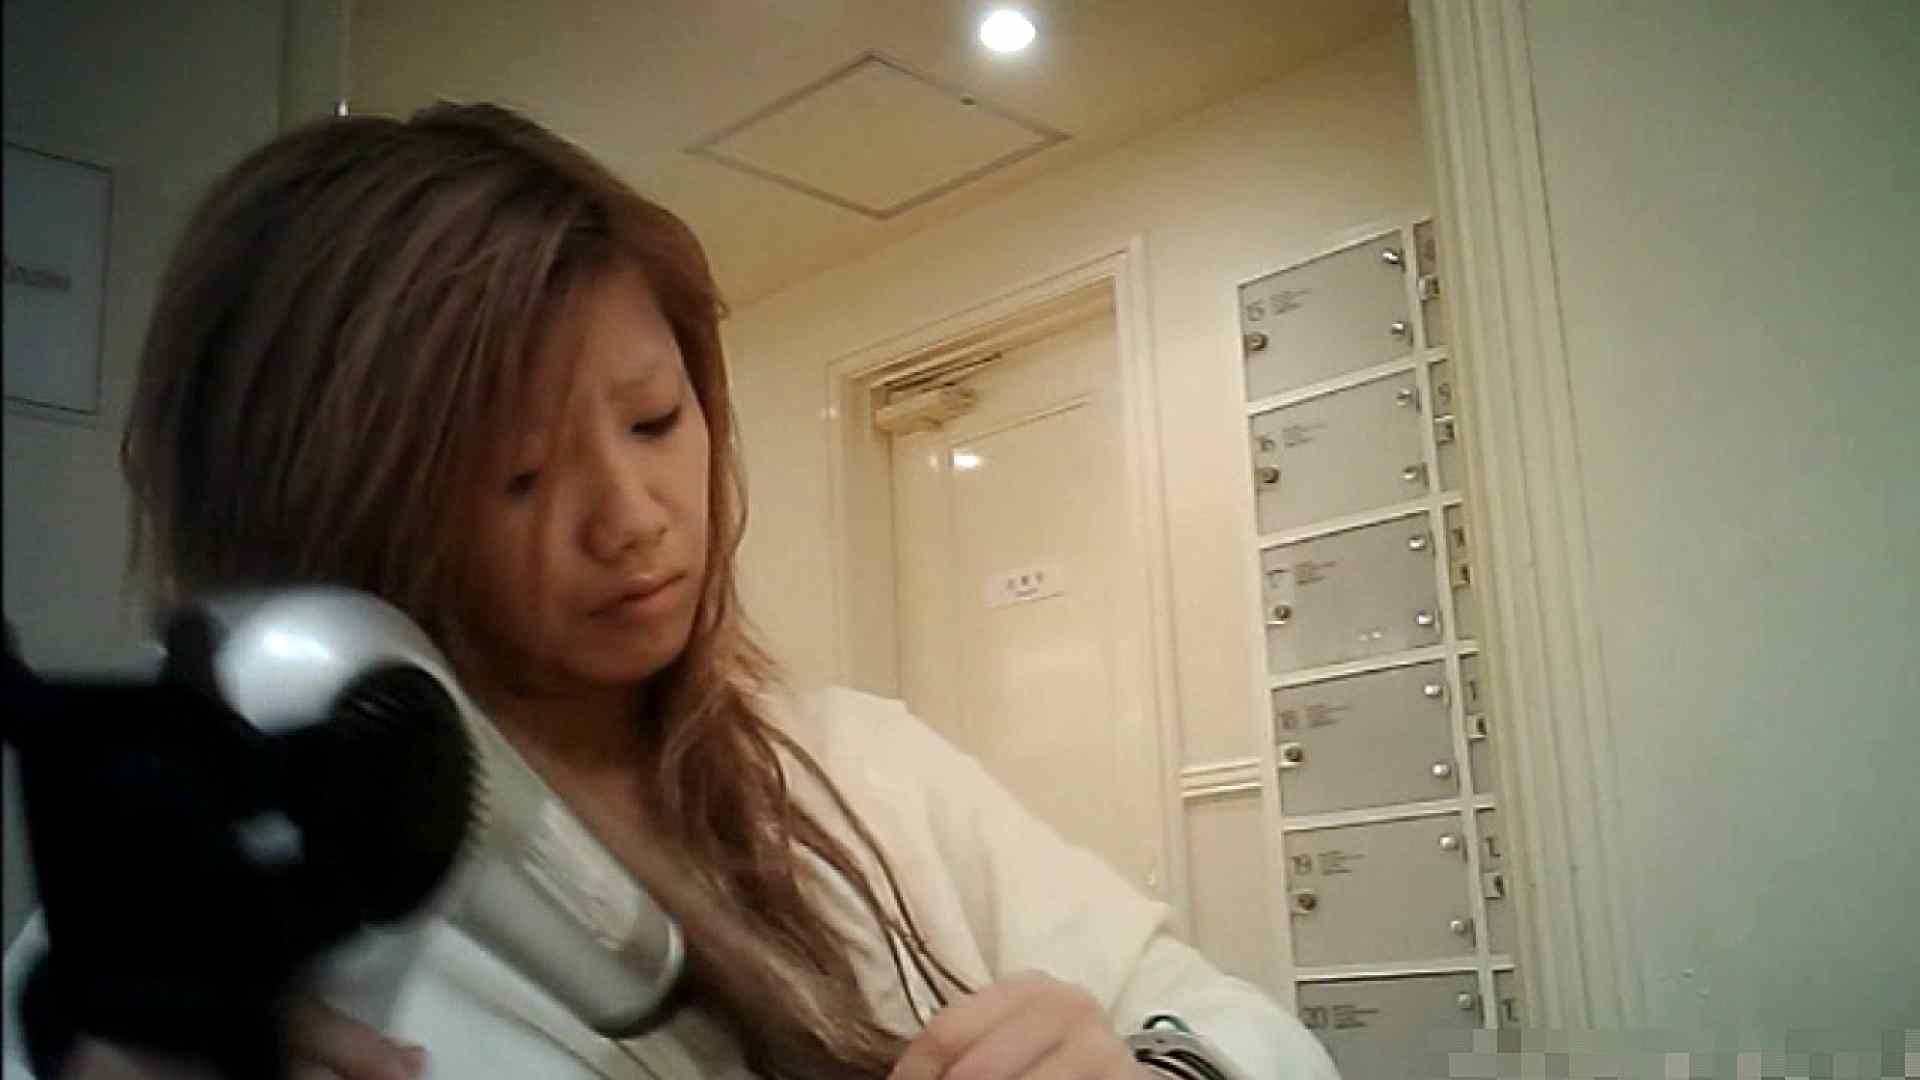 vol.7 【Mちゃん(入浴)】ブランド品査定士19歳 巨乳ギャル 知人 盗撮AV動画キャプチャ 81pic 79